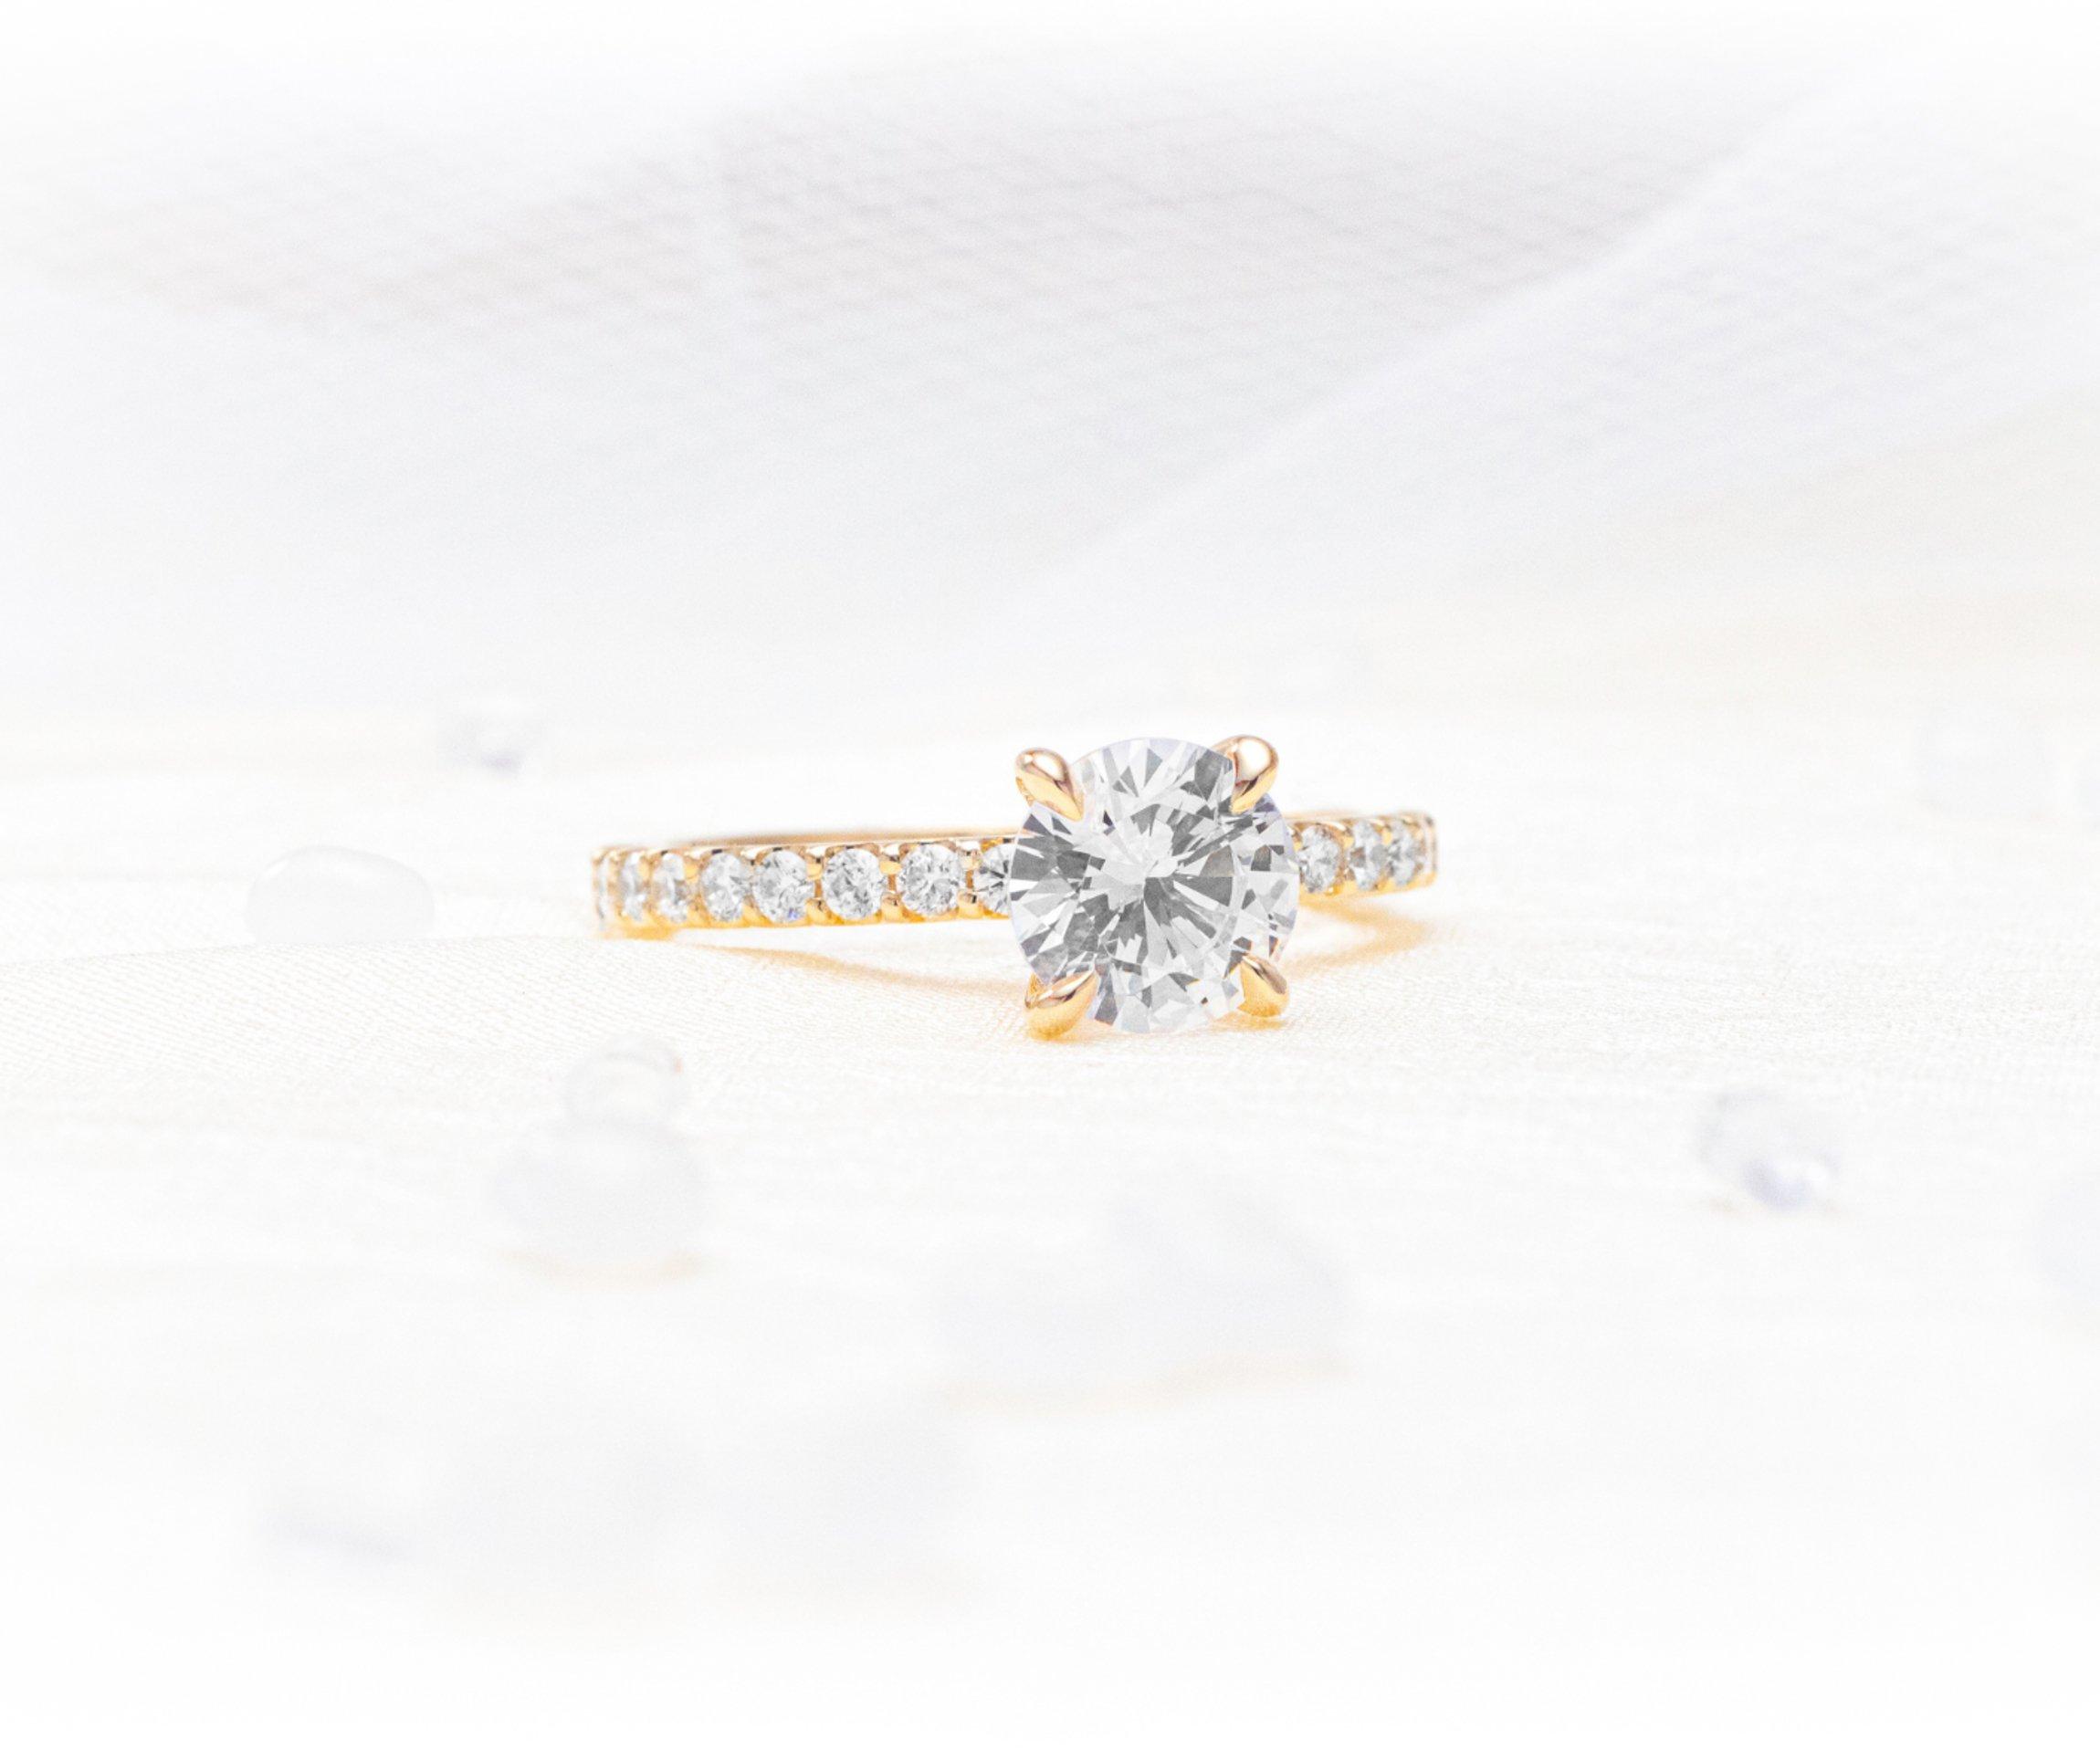 Solari 1.5mm Petite 3/4 Diamond Eternity Shared Prong